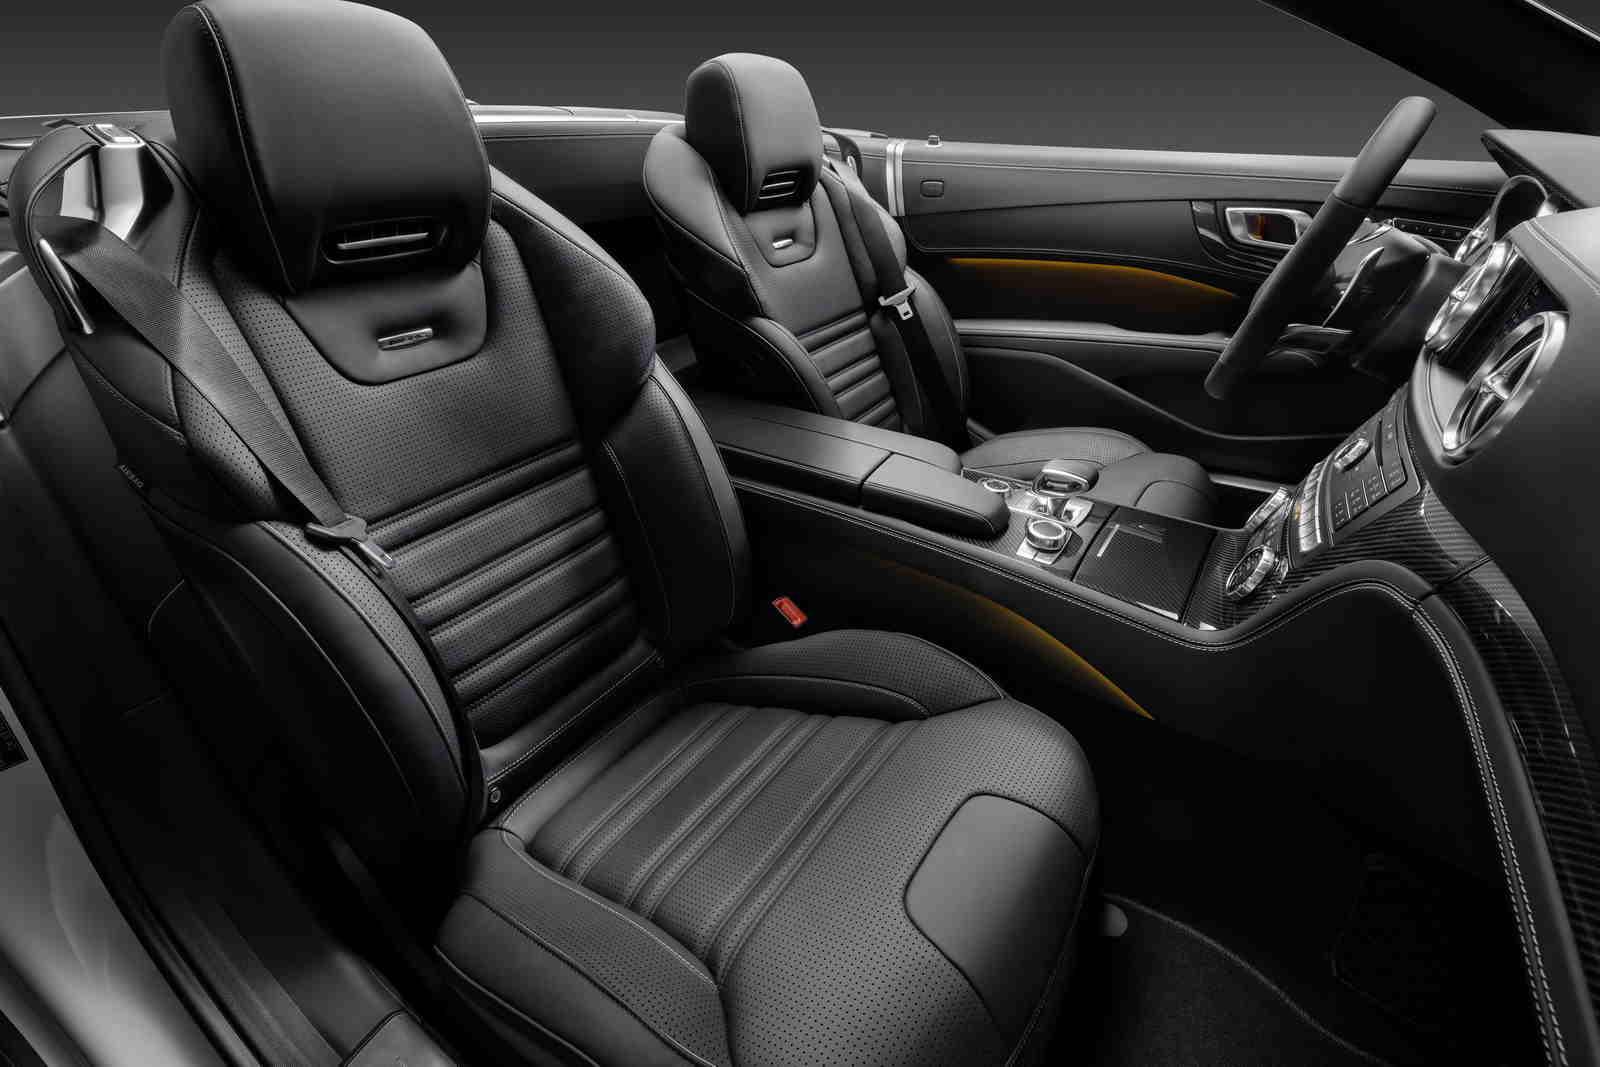 2017 mercedes-benz sl (30) - BenzInsider.com - A Mercedes ...